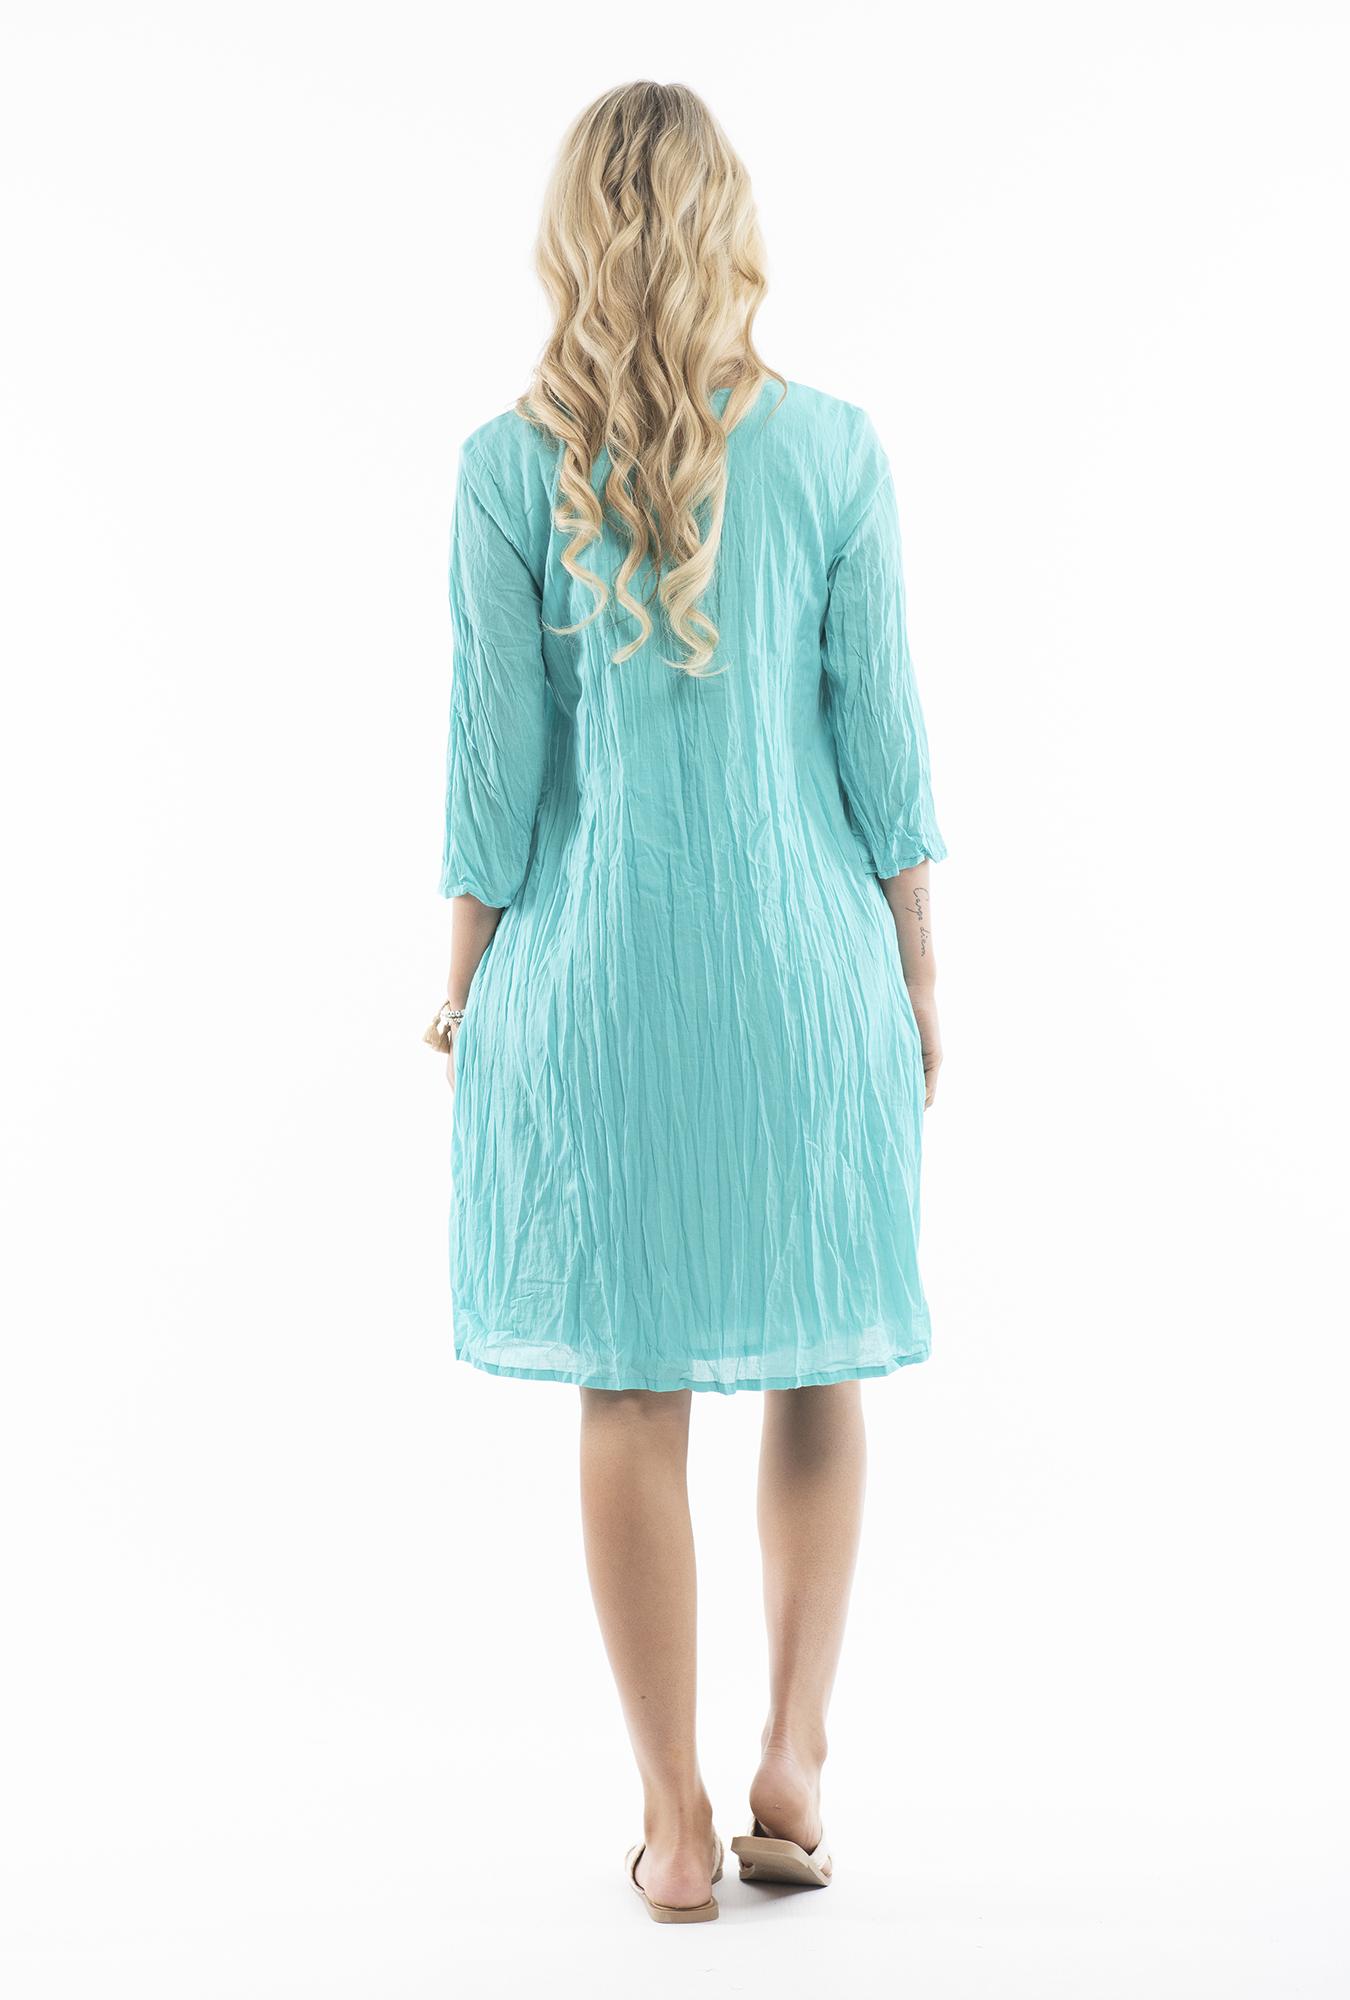 Leyla Dress in Teal